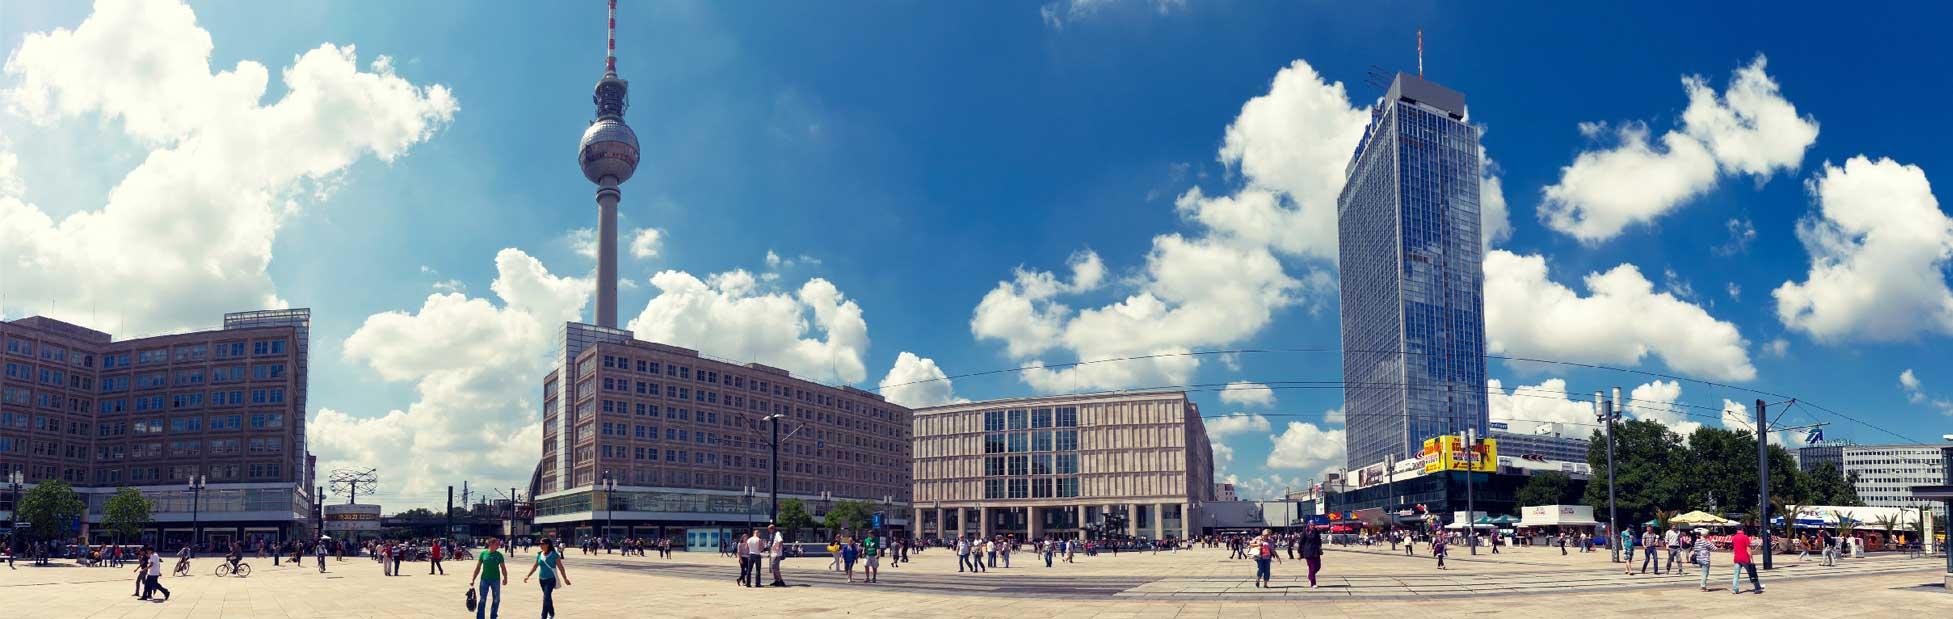 unser institut f r arzneimittelforschung in berlin. Black Bedroom Furniture Sets. Home Design Ideas